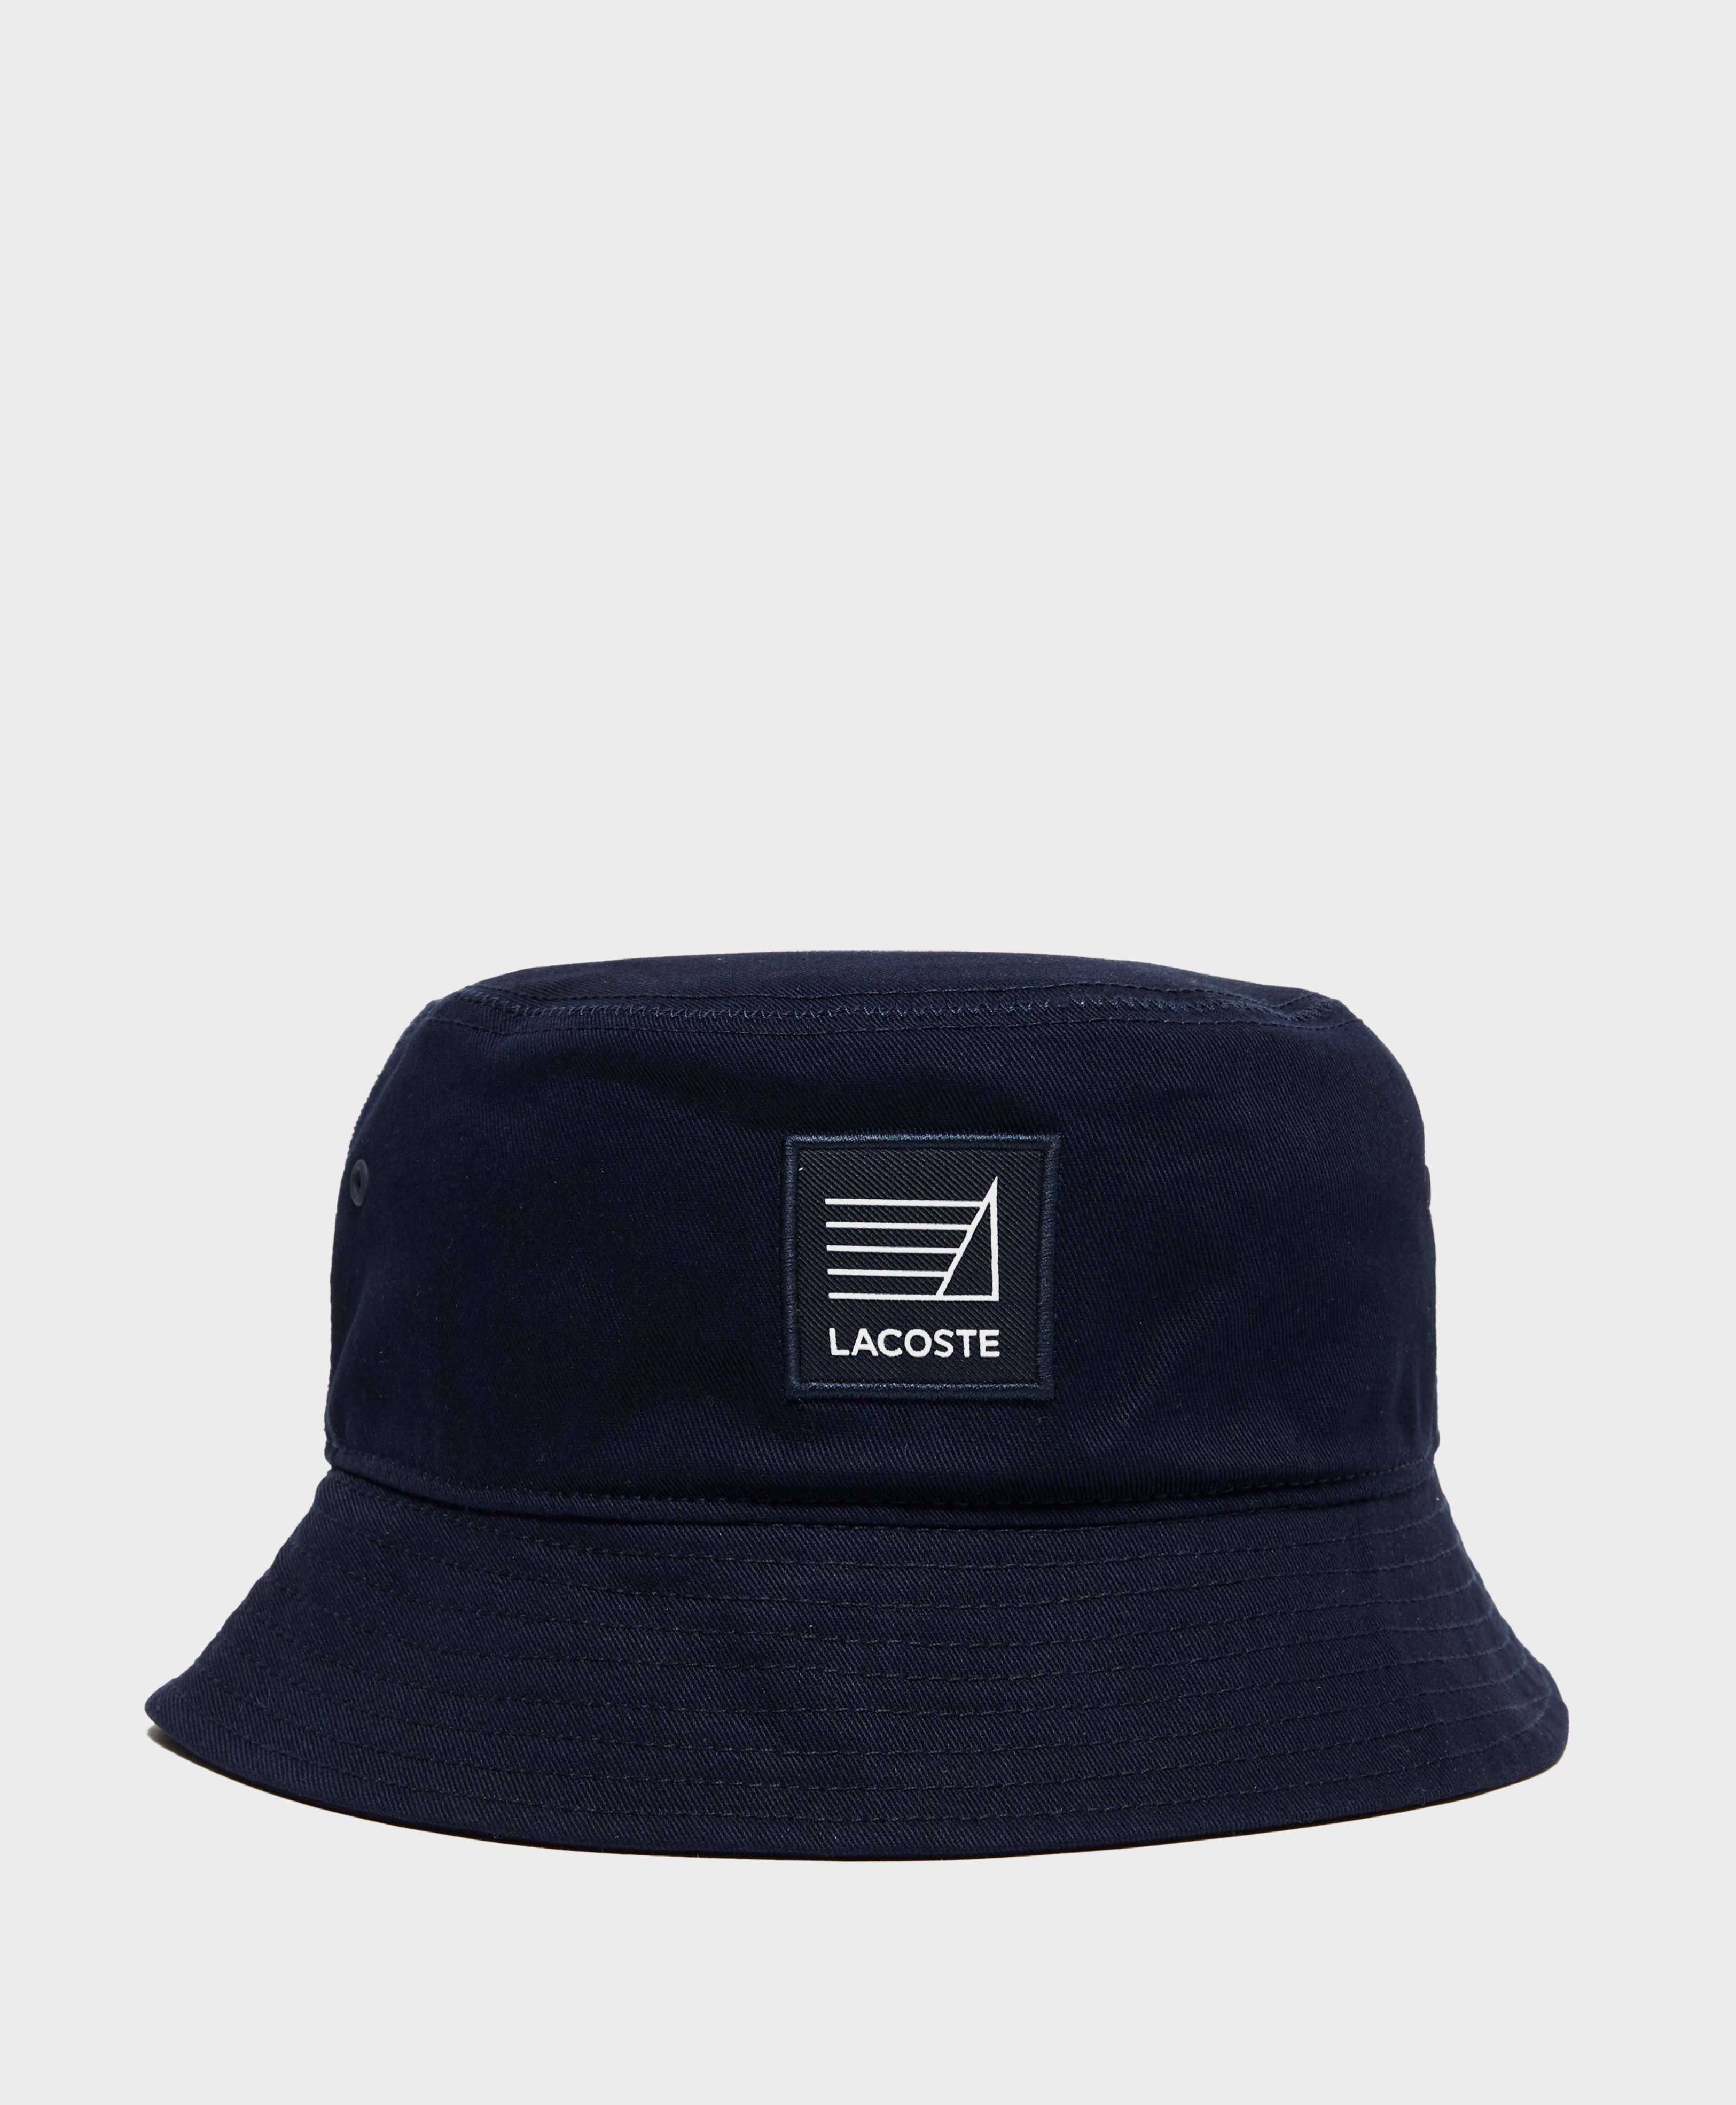 Lacoste Logo Bucket Hat  91ad2afe112